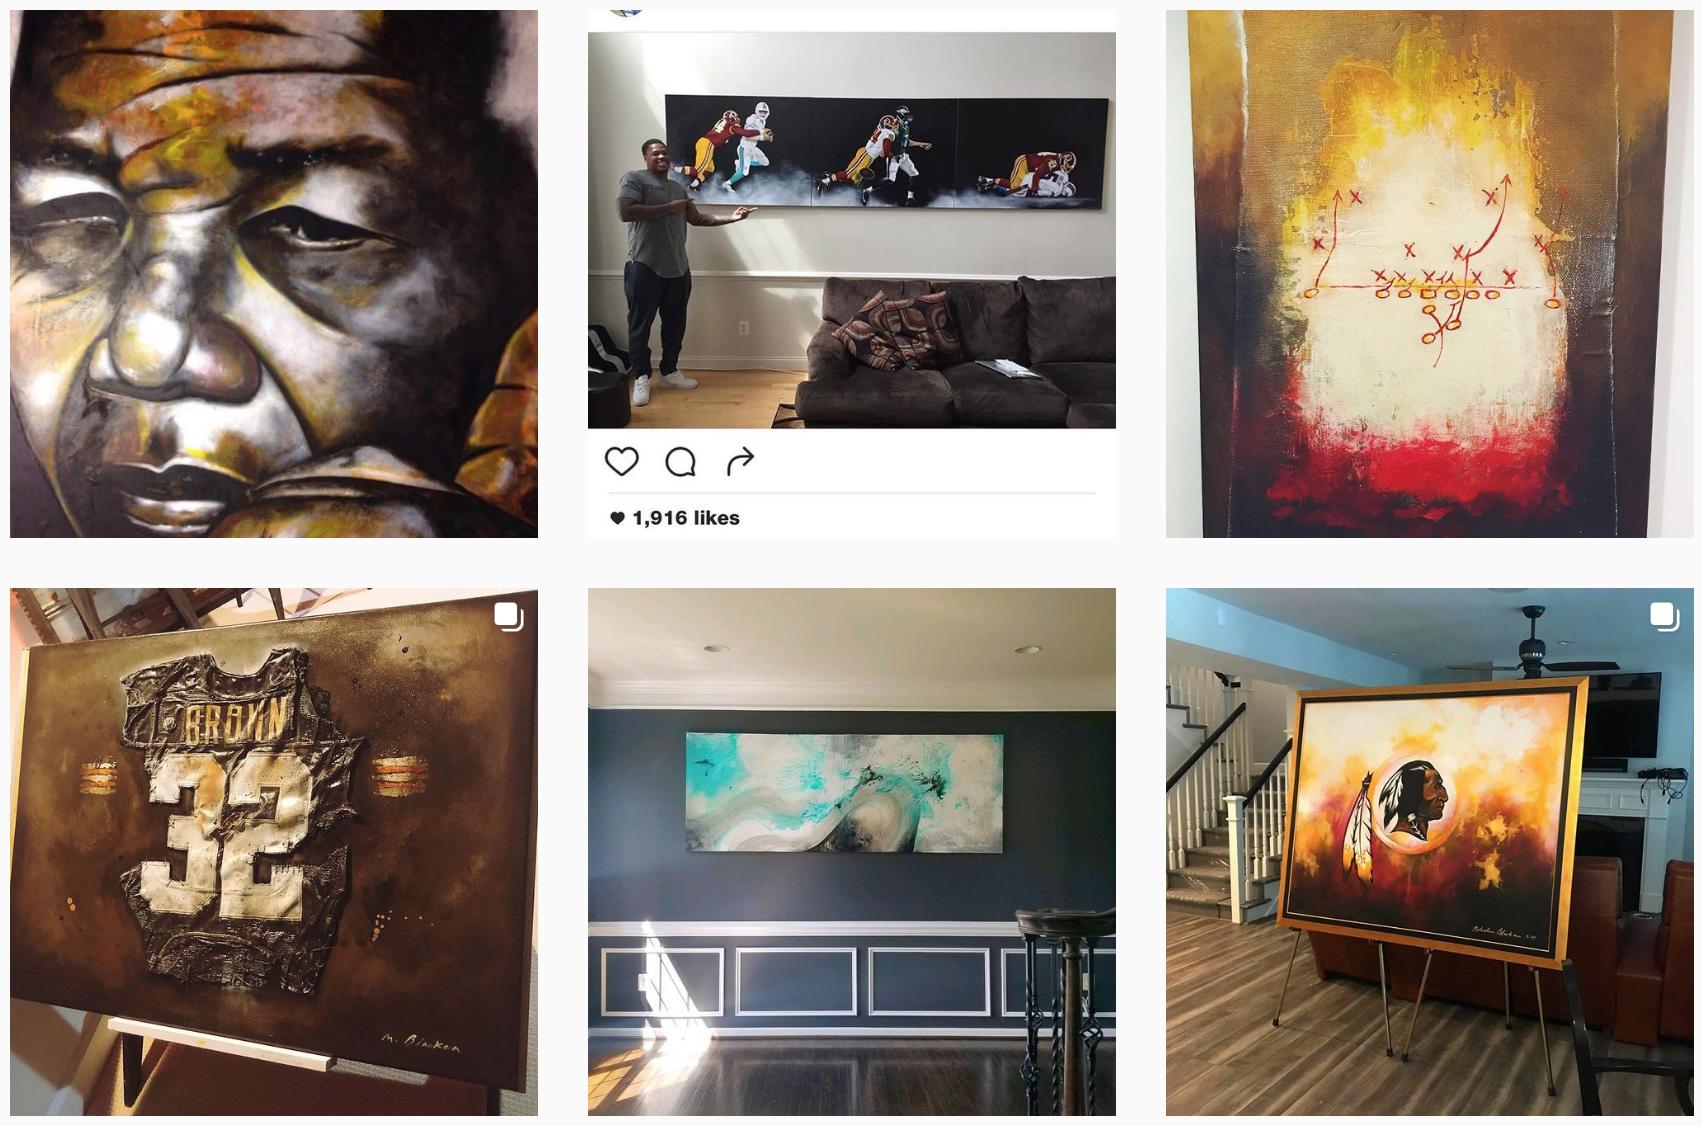 malcom-blacken-instagram-feed